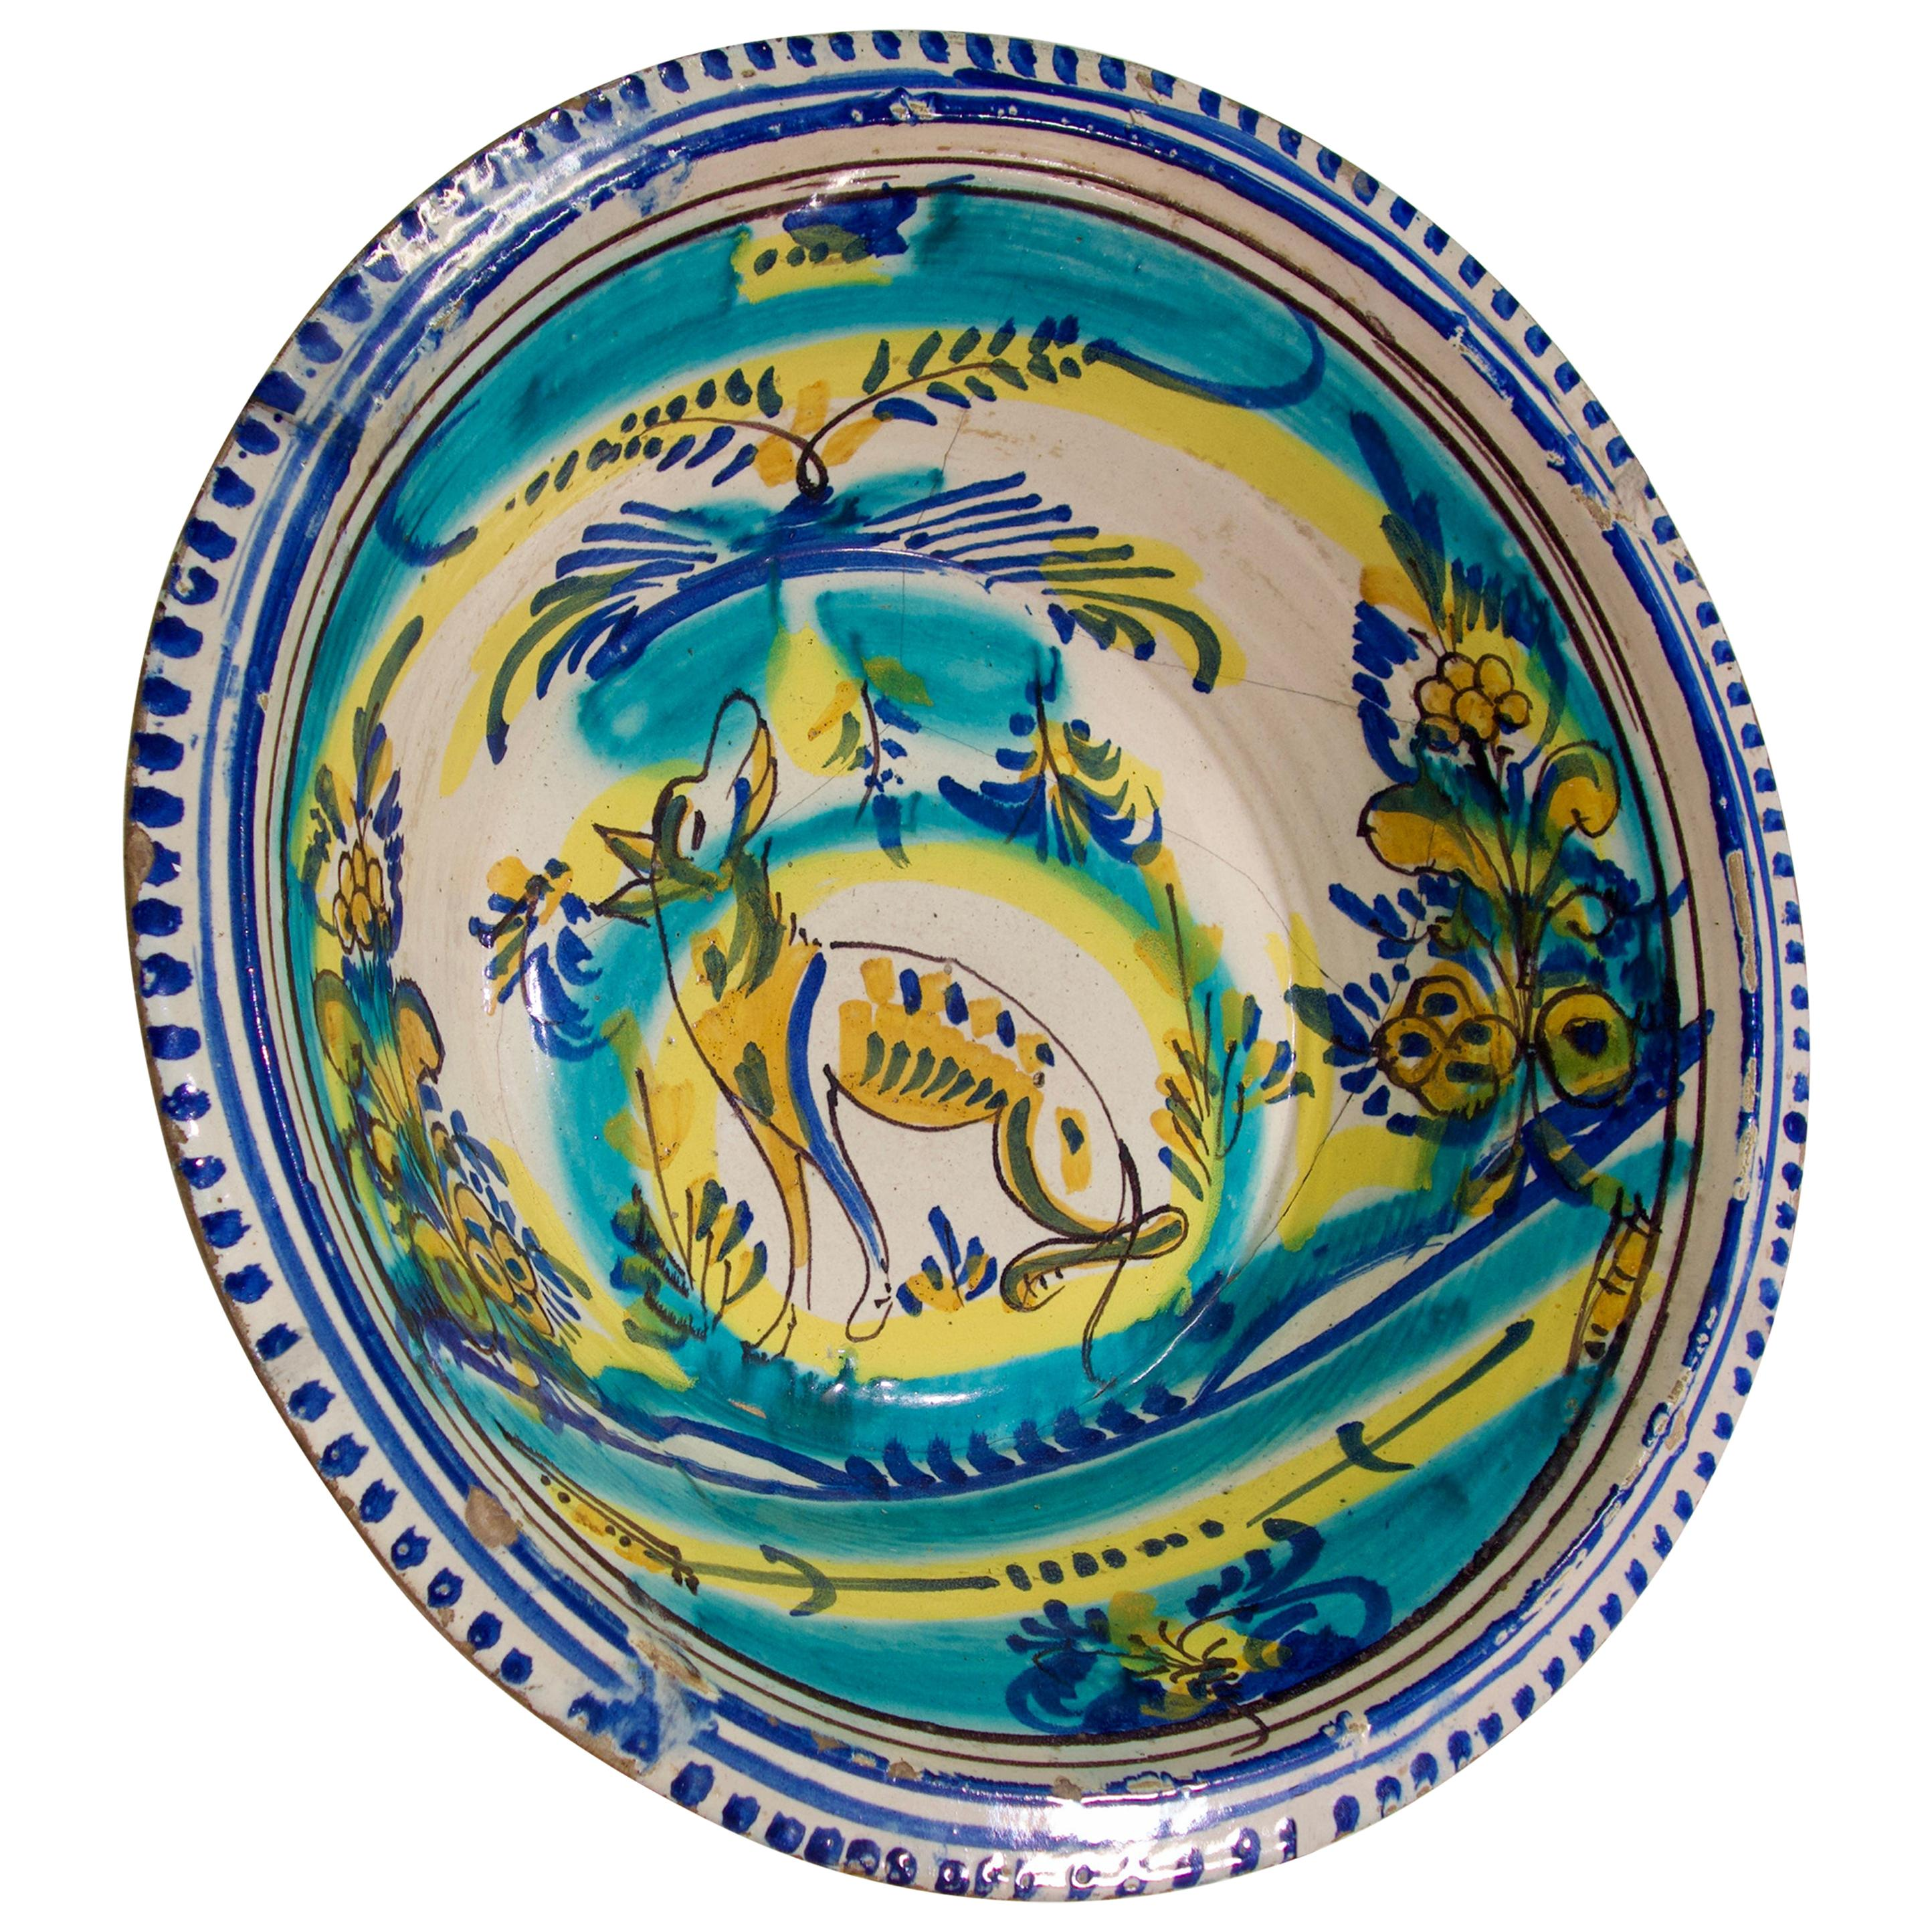 A Large 19th Century Spanish Lebrillo, Triana Bowl